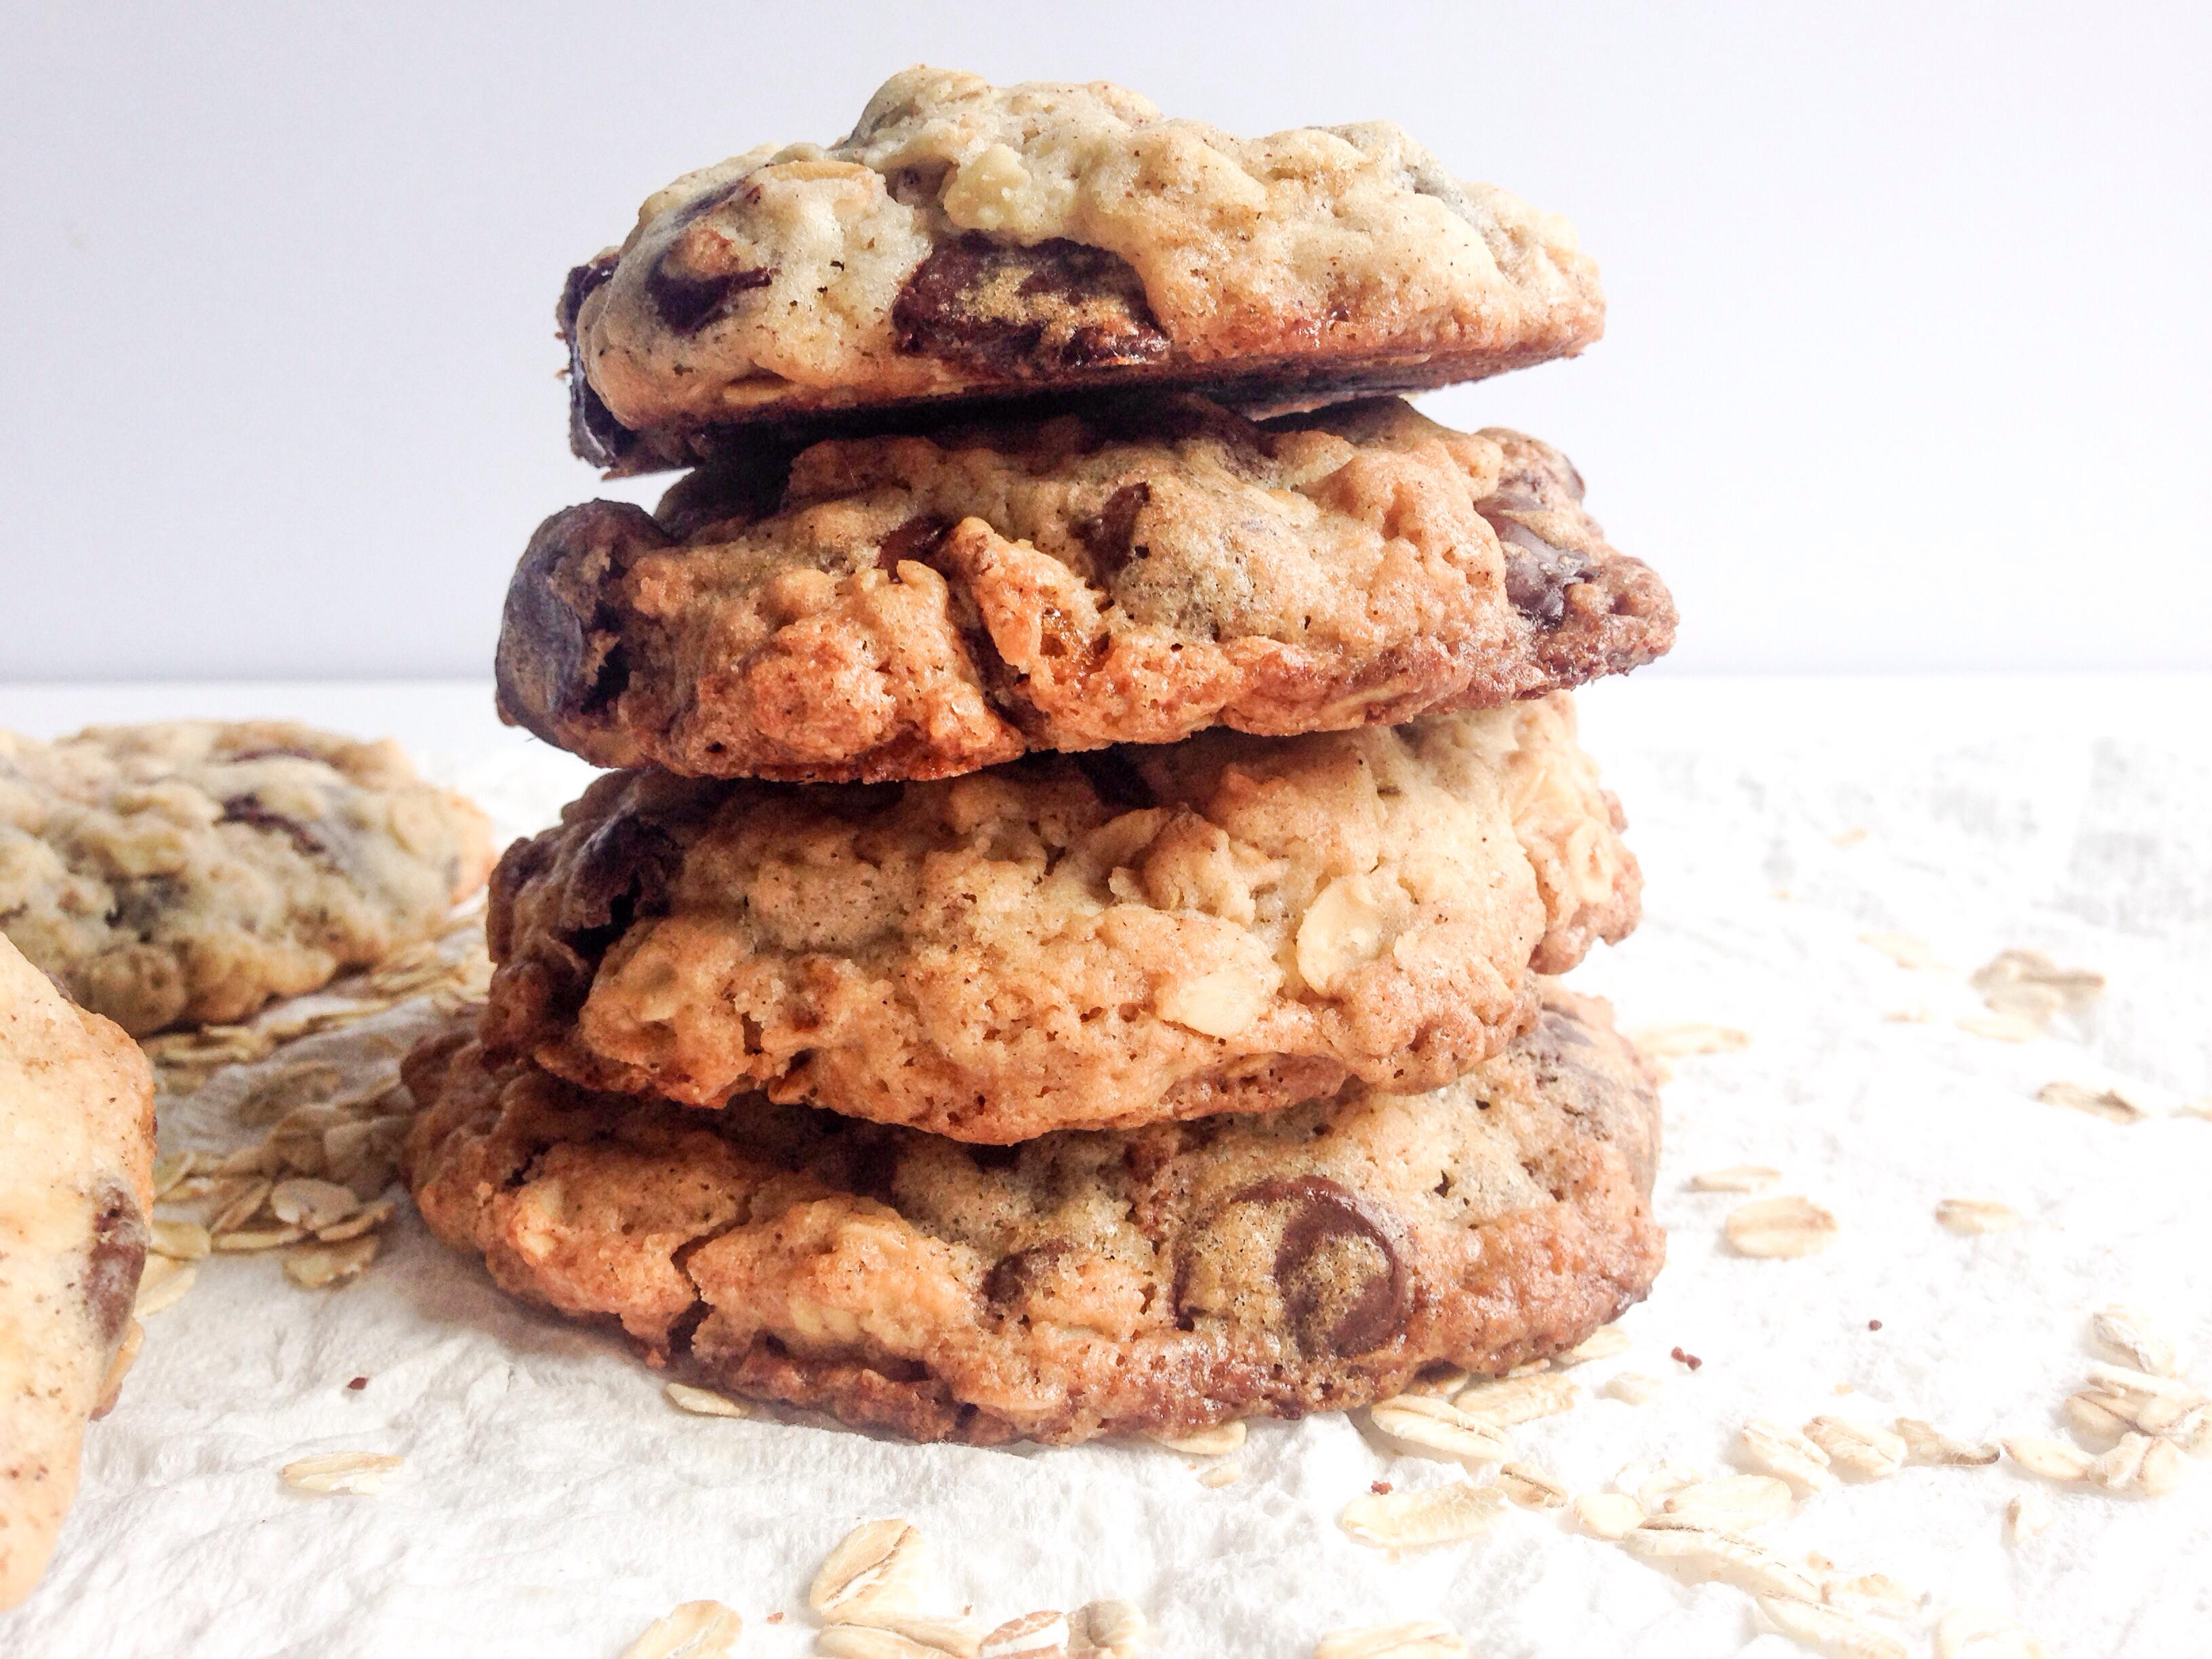 Chocolate Chunk Oats and Raisins Cookie